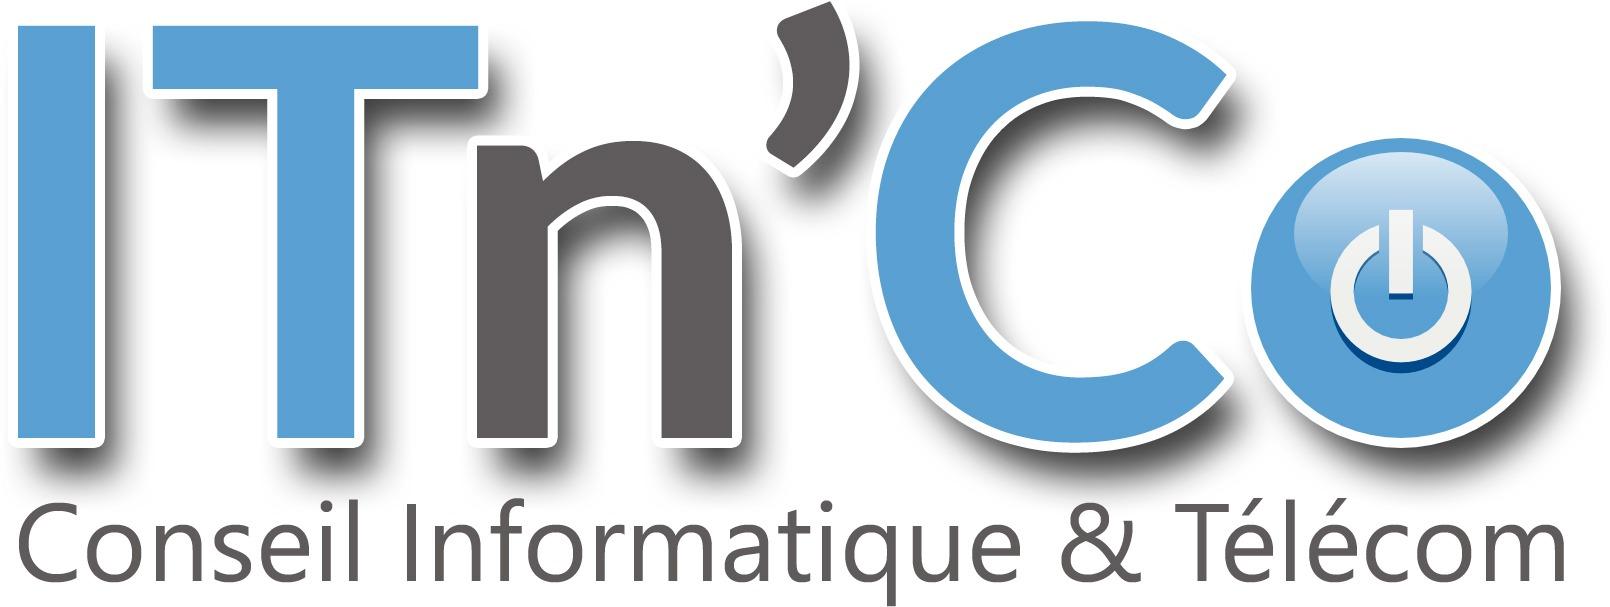 Plateforme de formation ITn'Co